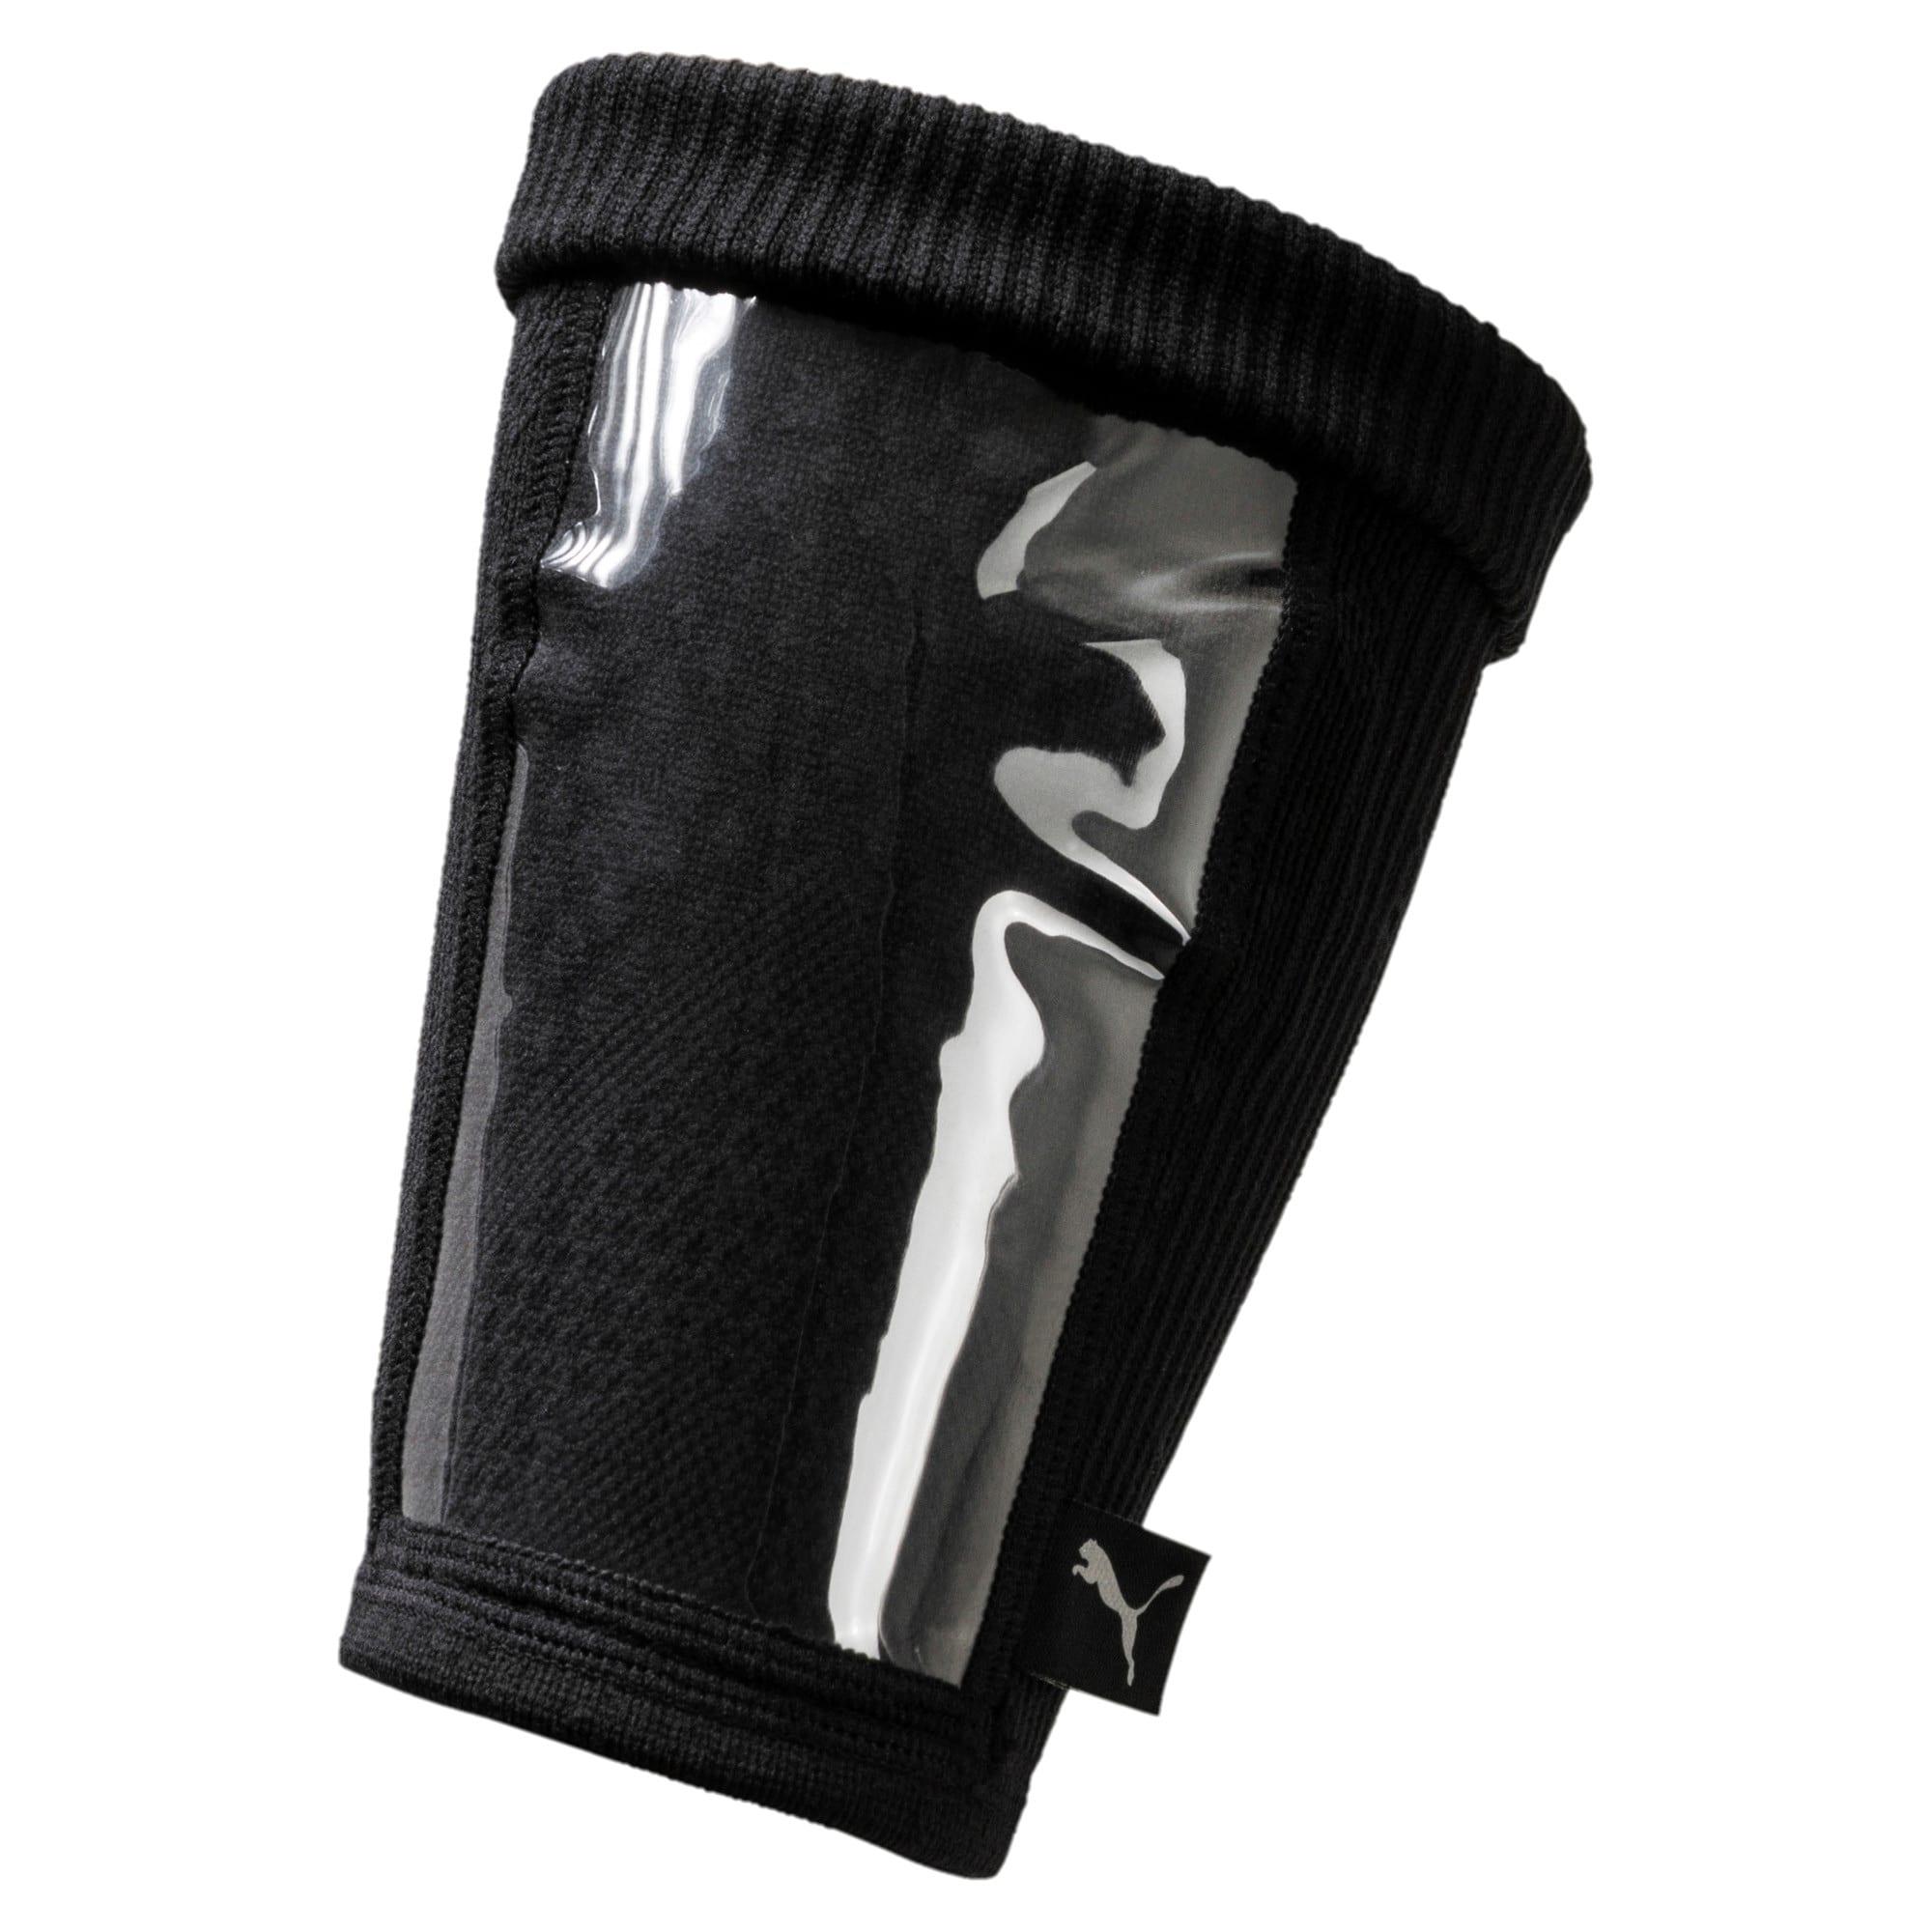 Thumbnail 1 of Running evoKNIT Armband, Puma Black, medium-IND